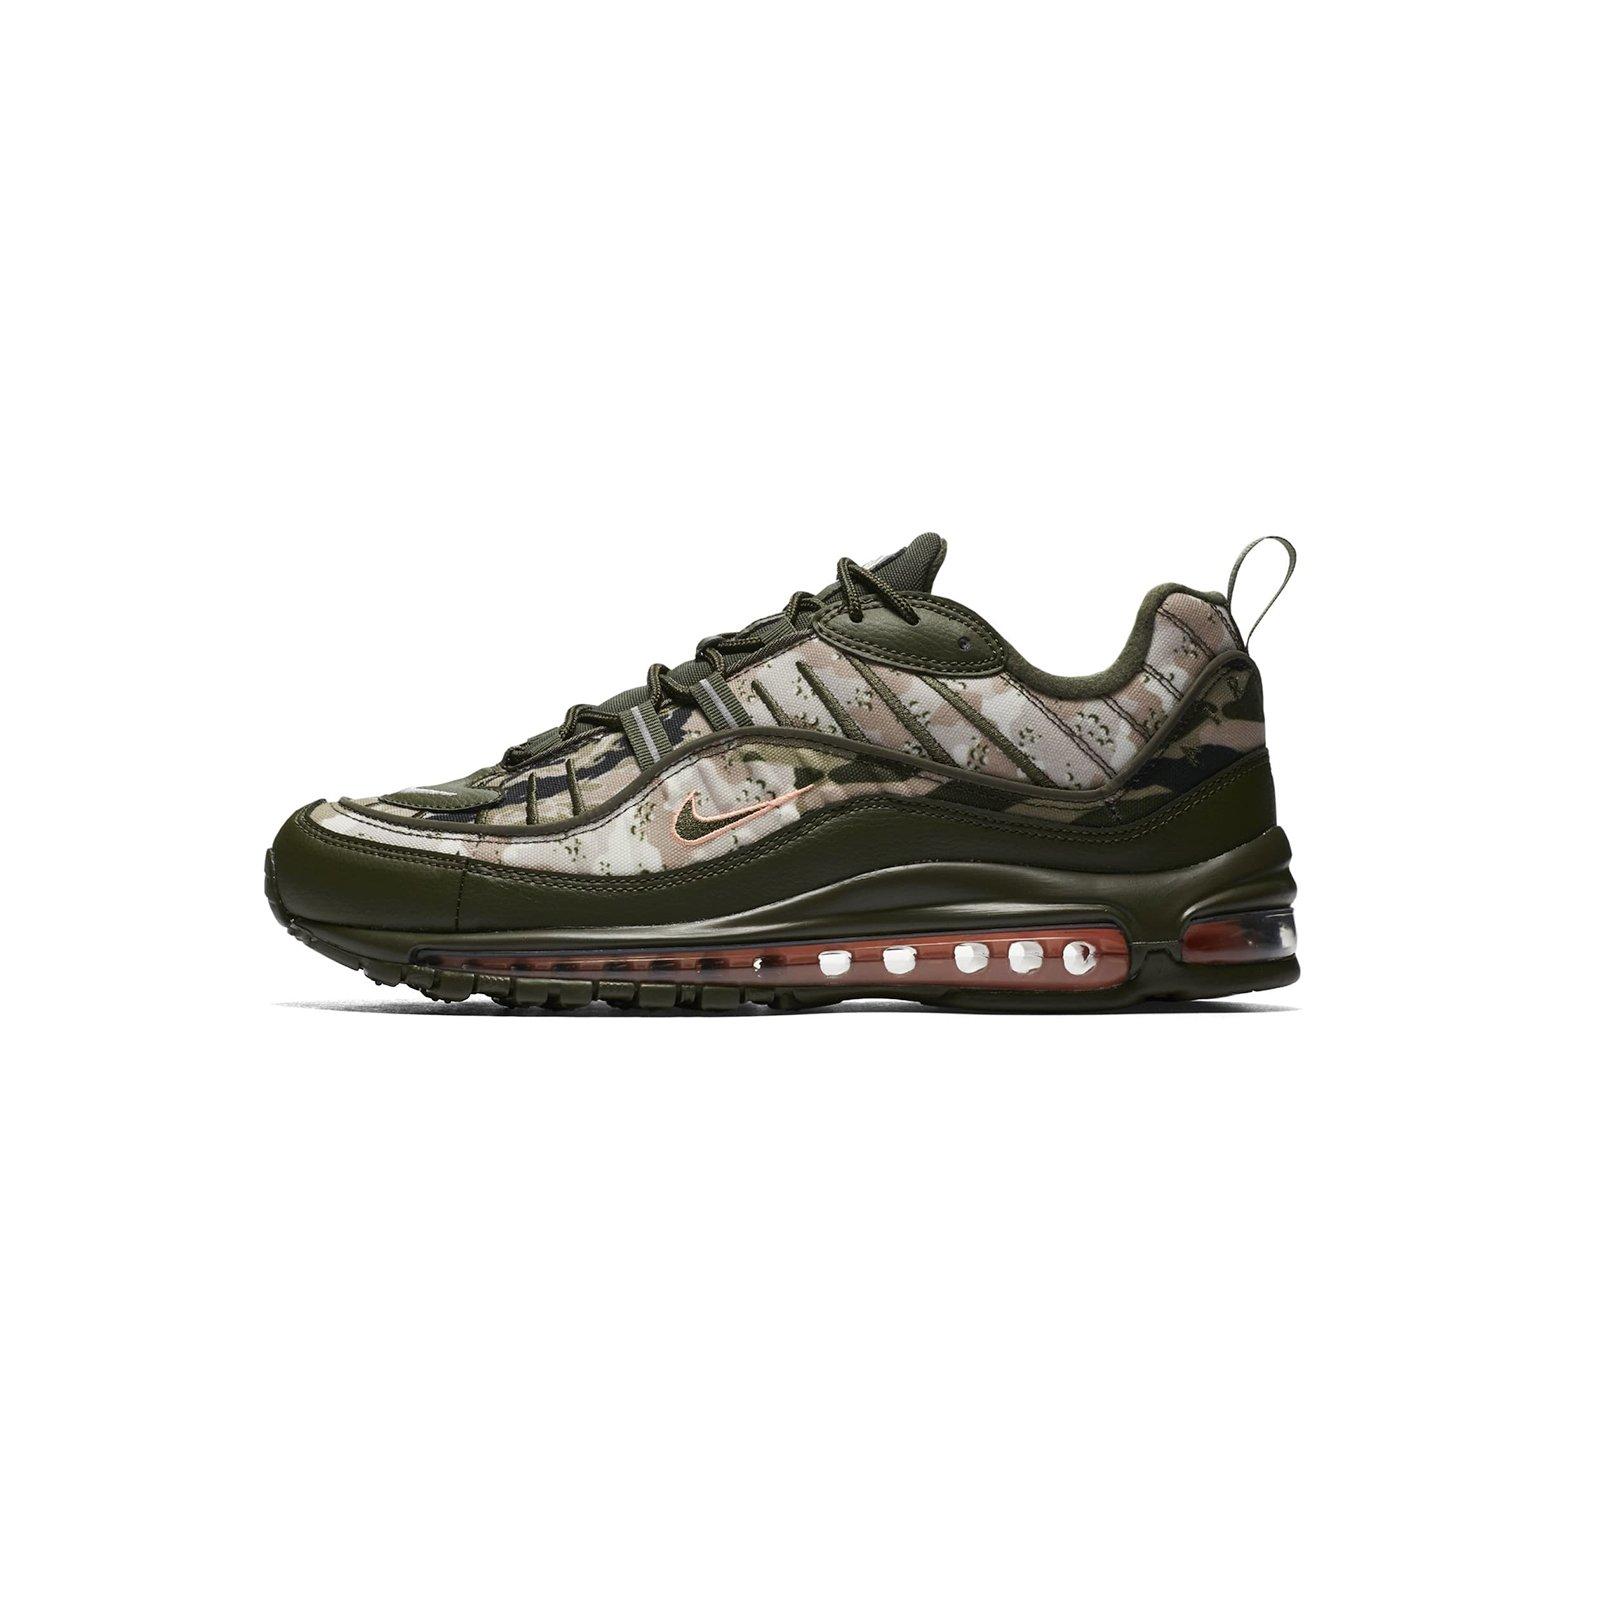 Nike Air Max 98 Camo Aq6156 300 Sneakersnstuff